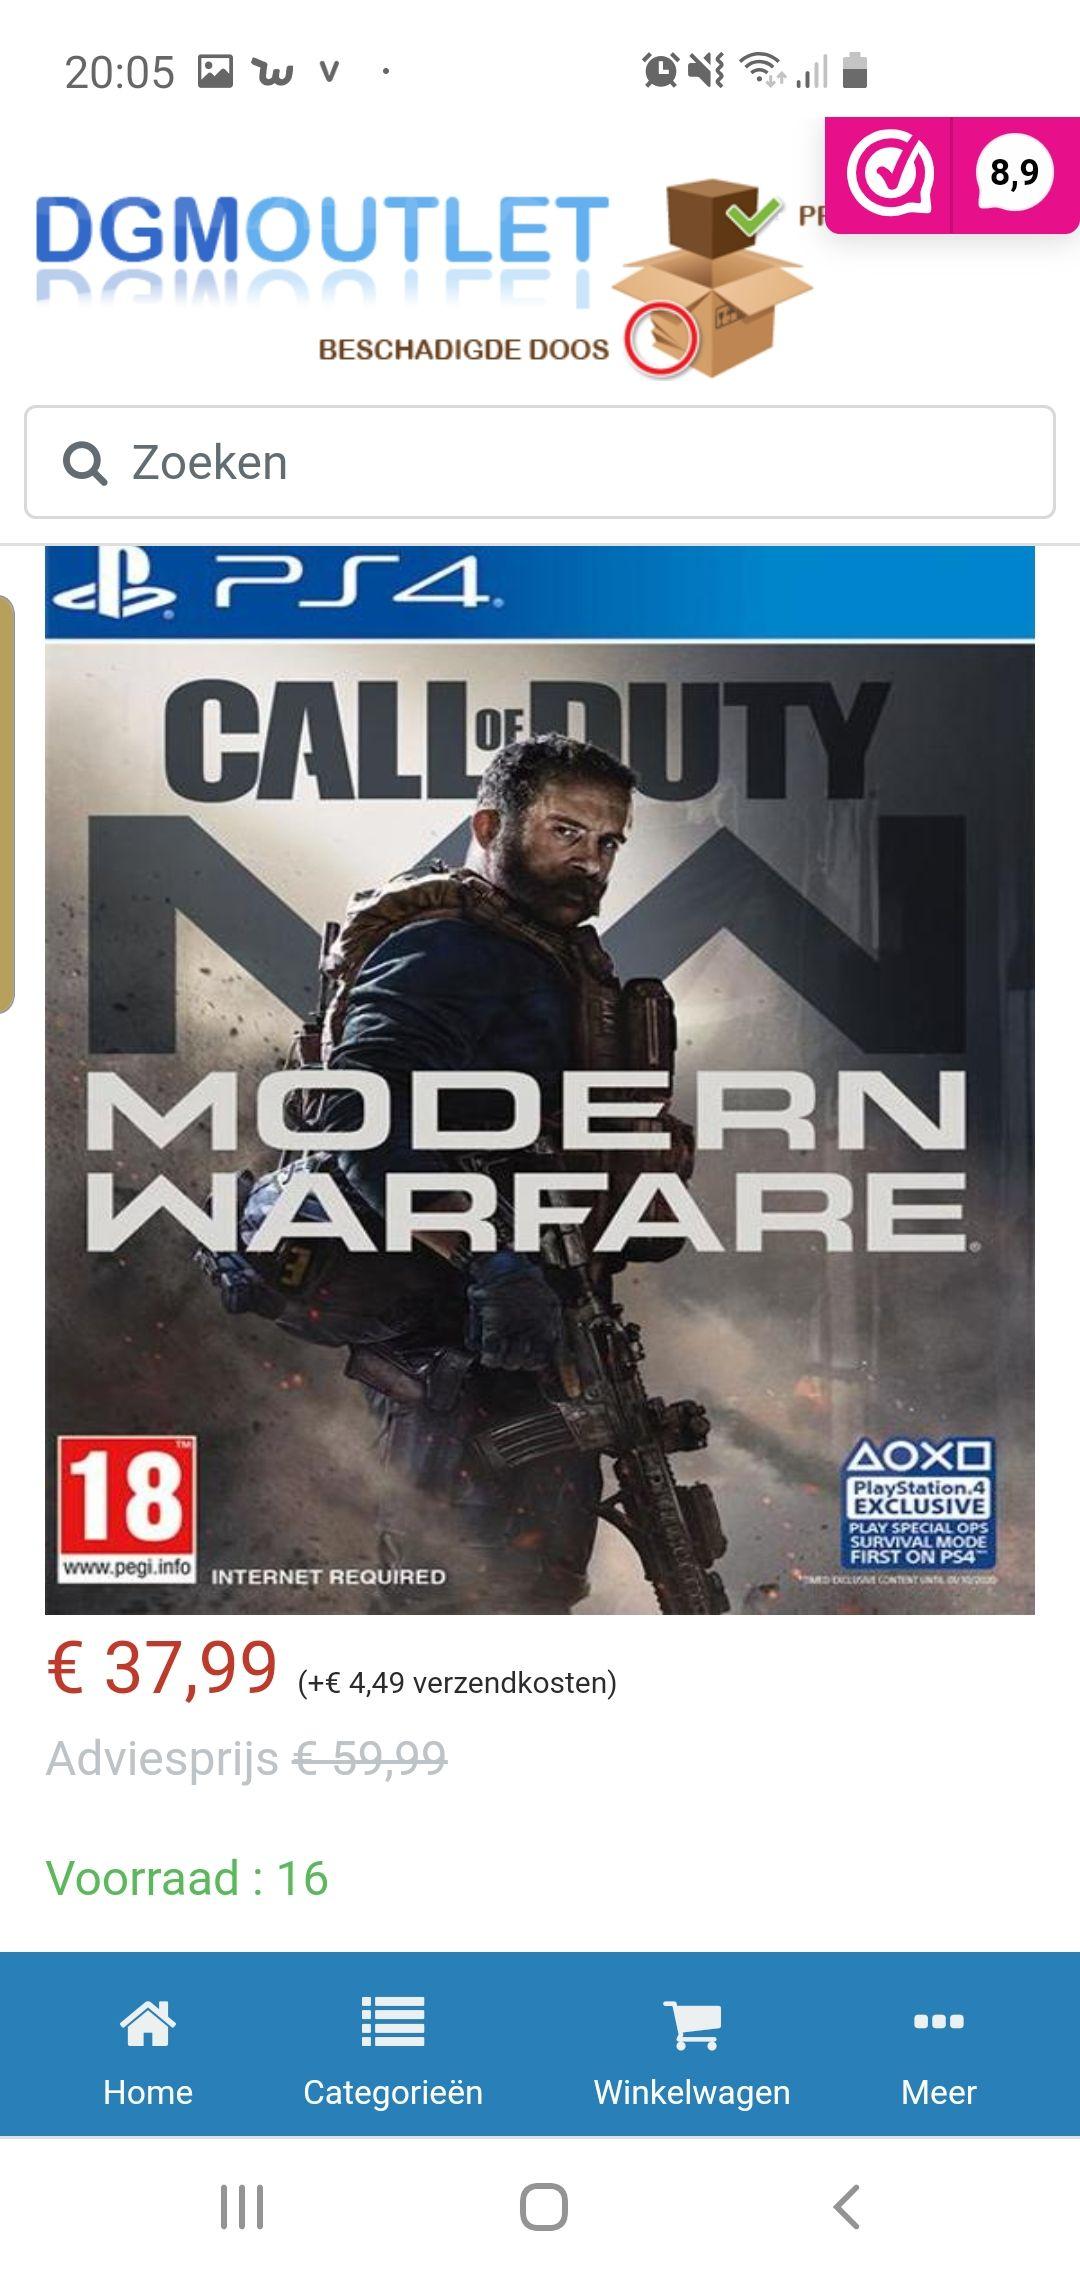 Call of duty modern warfare voor de playstation 4